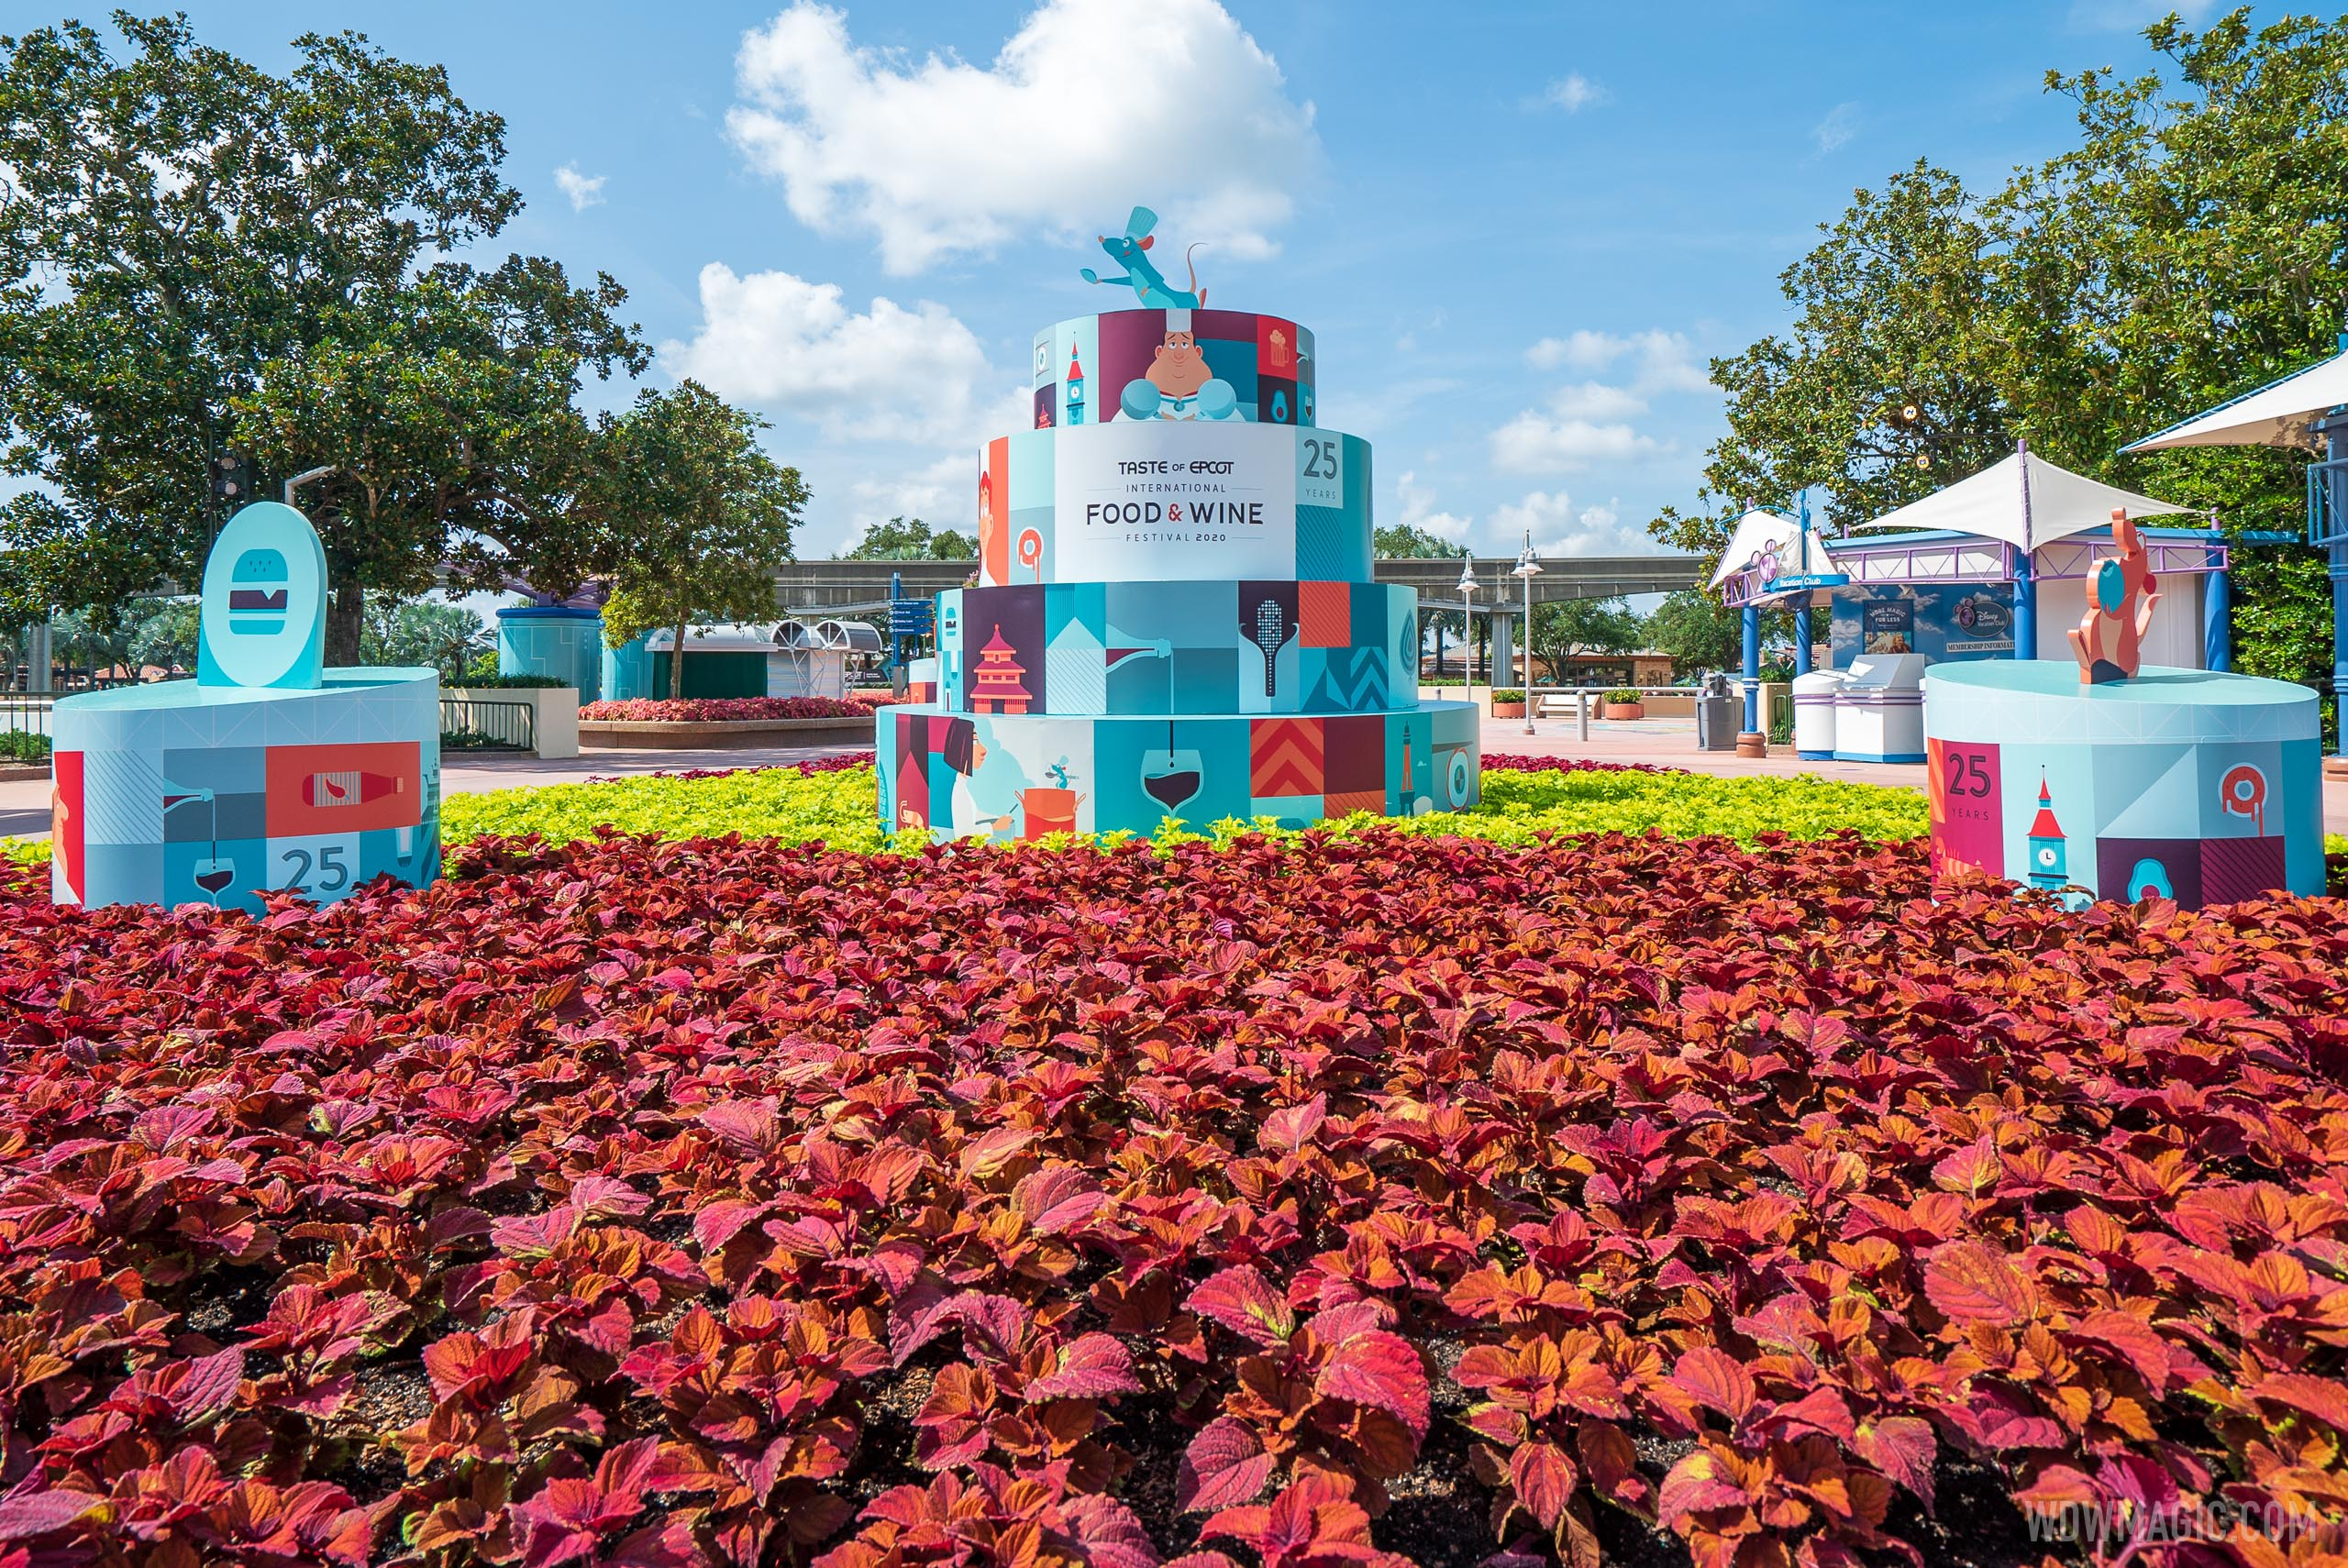 2020 Taste of EPCOT International Food and Wine Festival